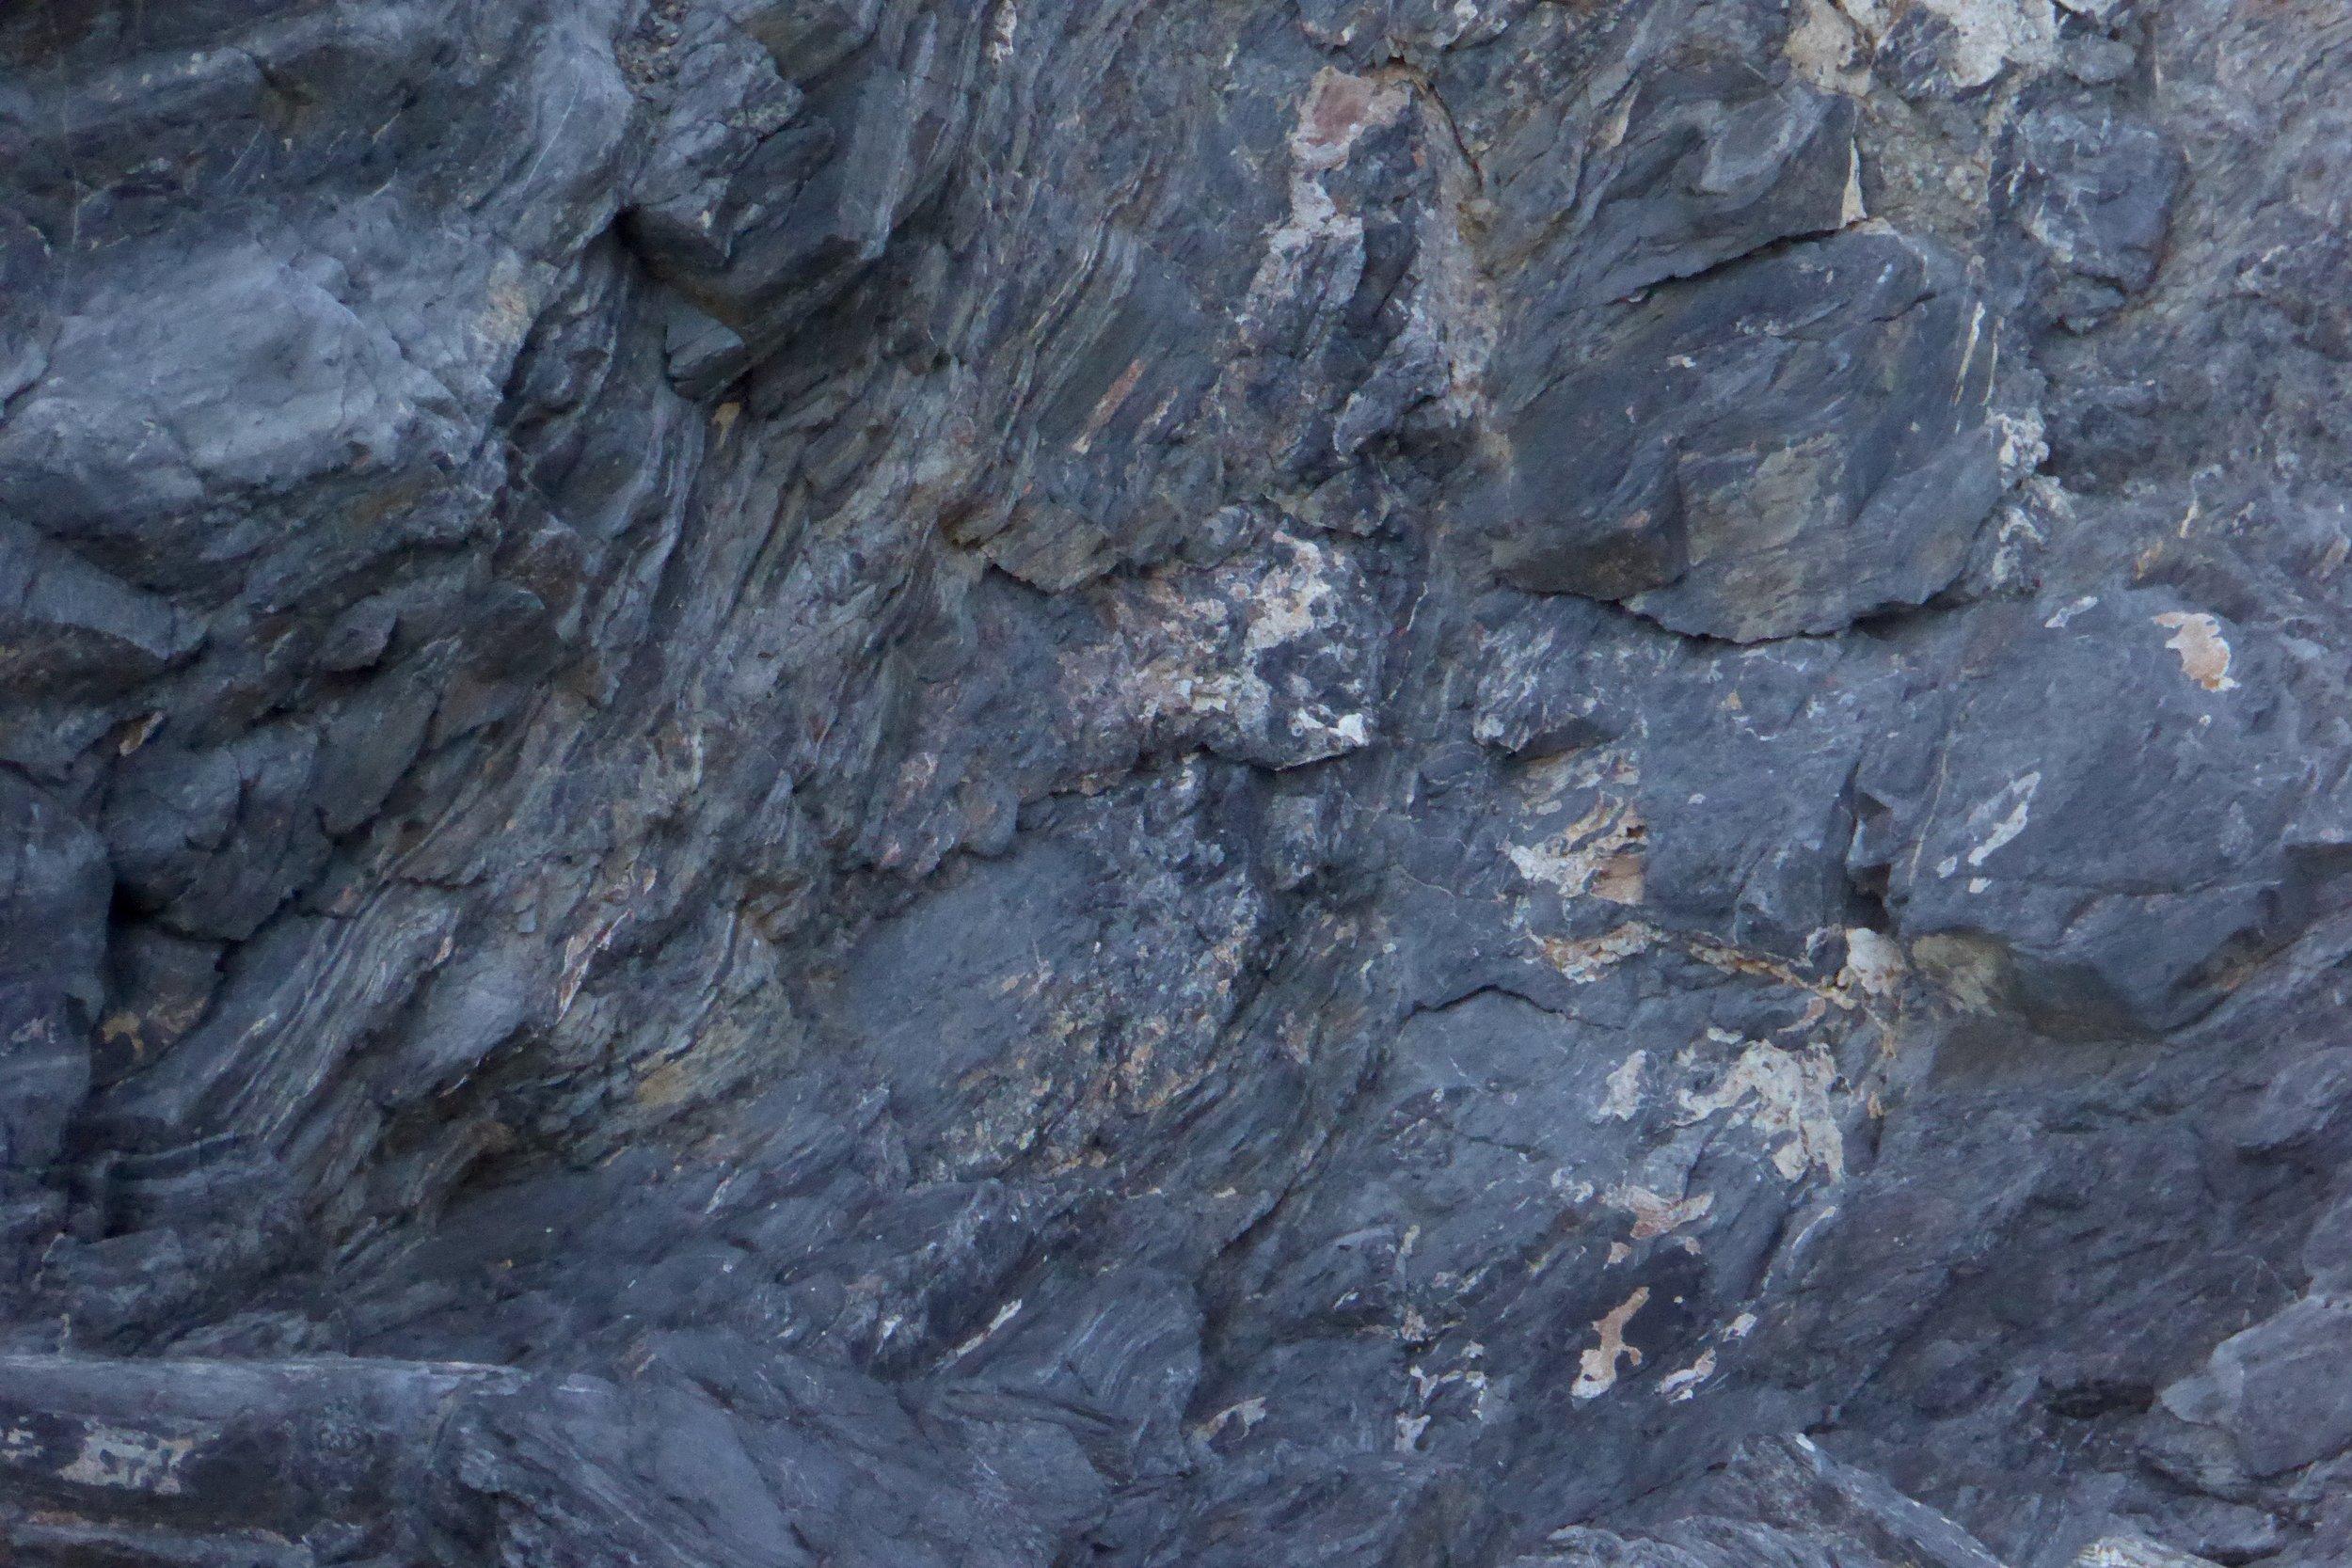 More interesting rock